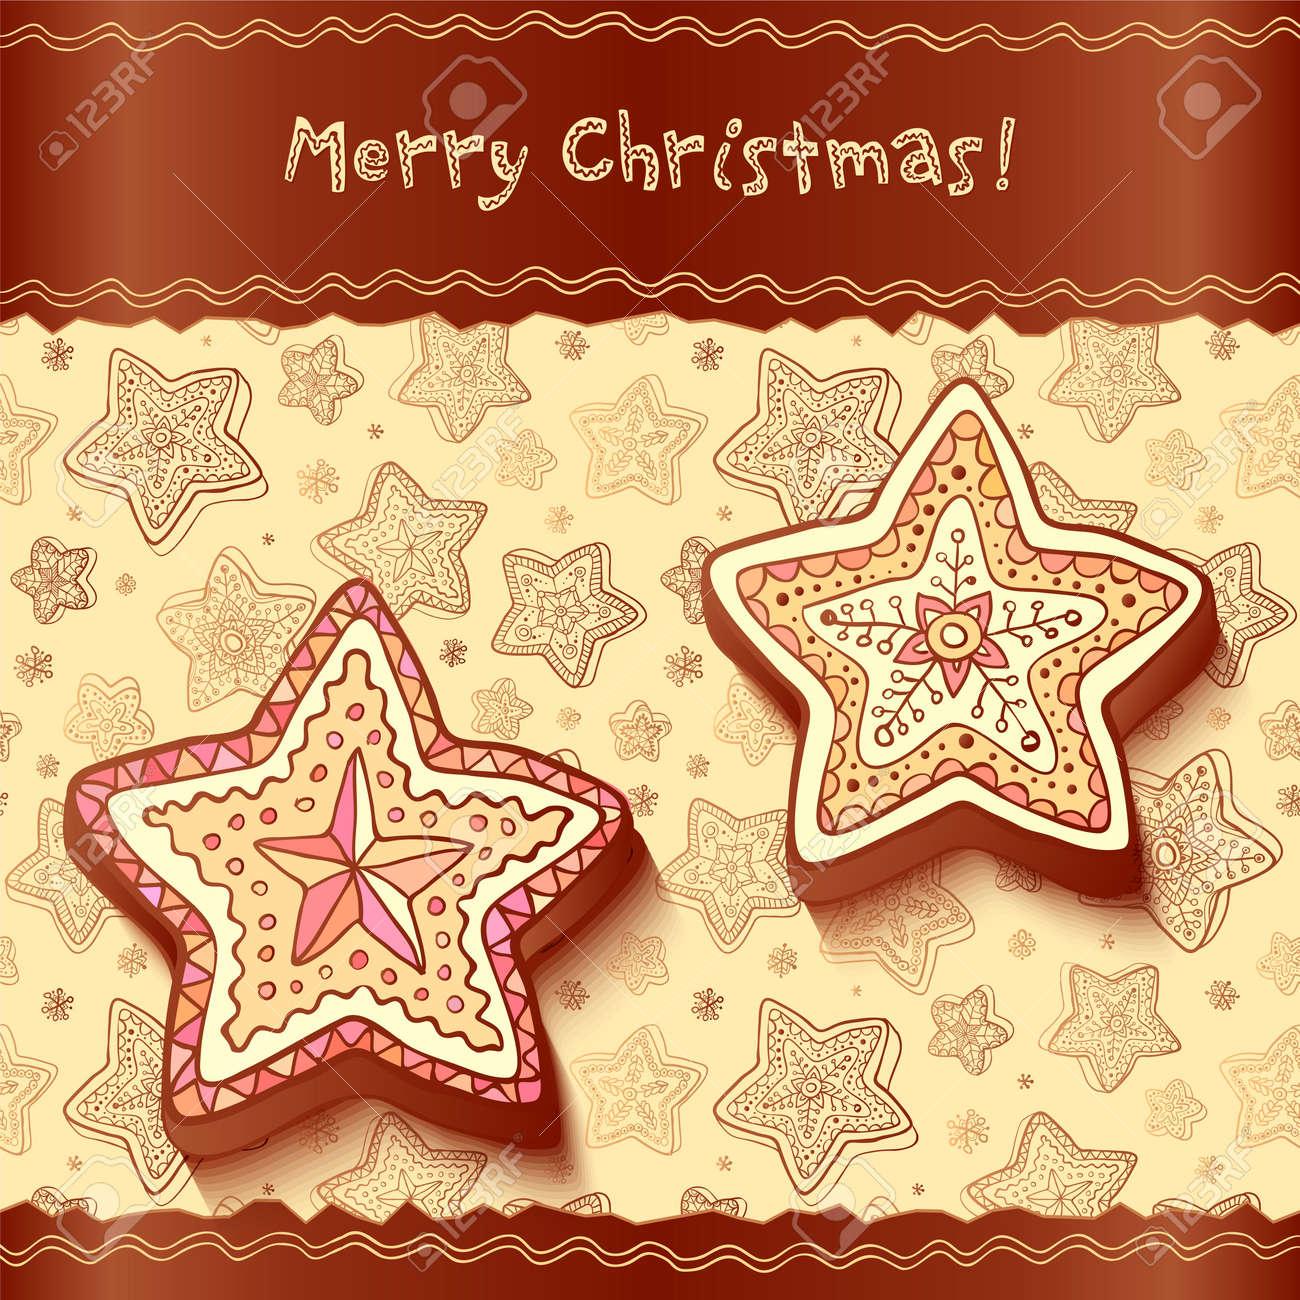 Christmas chocolate honey-cakes greetings card Stock Vector - 16173770